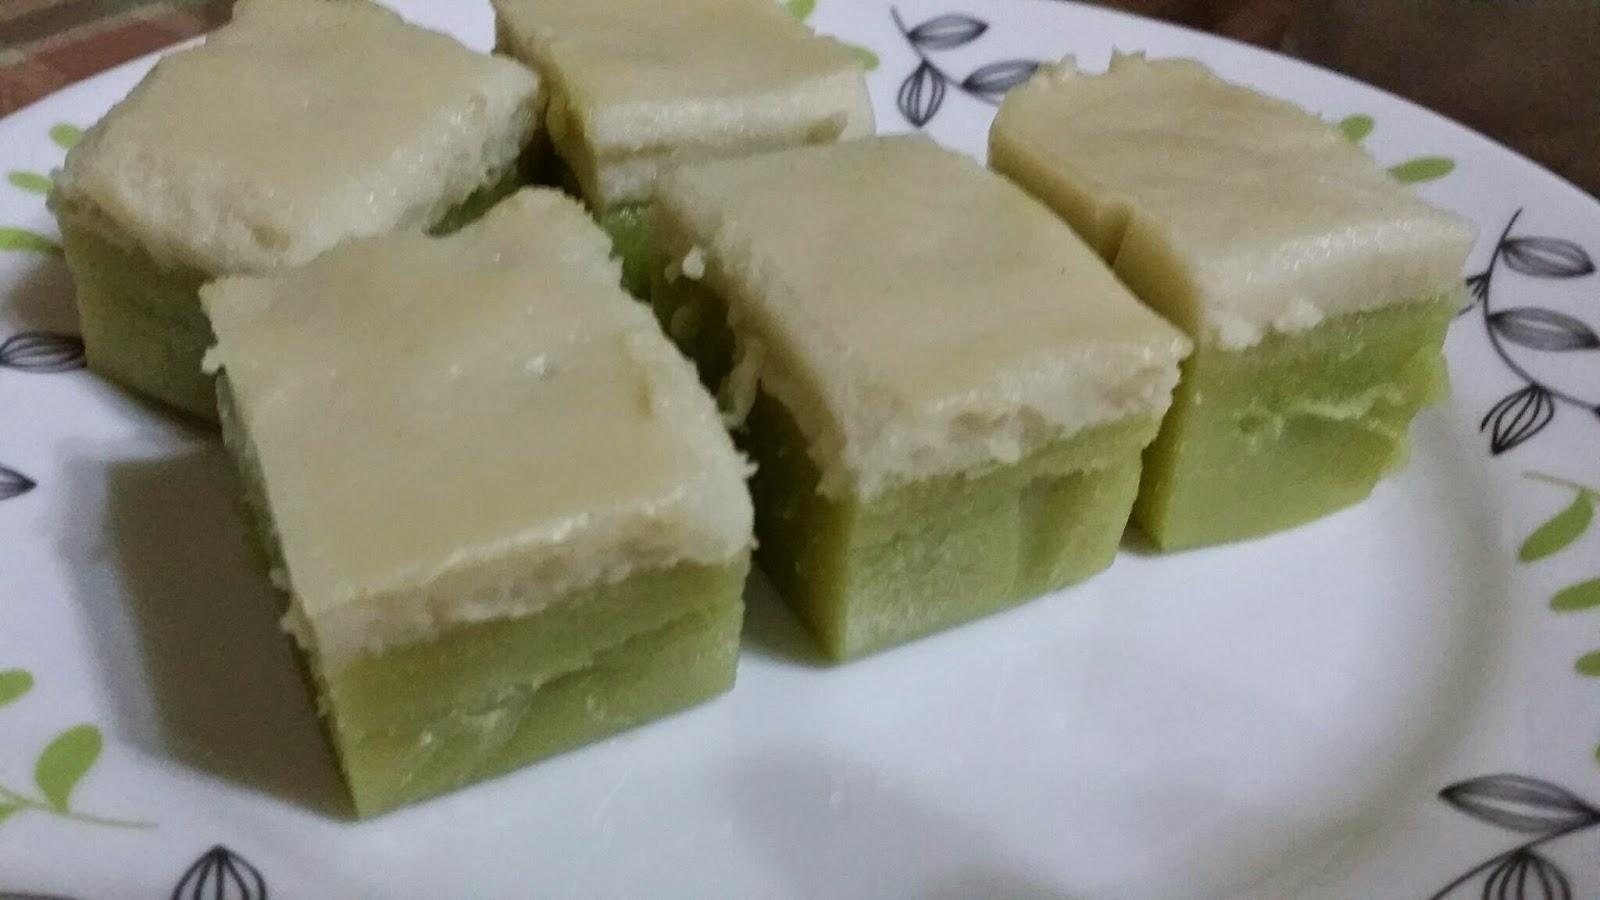 ZULFAZA LOVES COOKING: Kuih tepung talam gandum